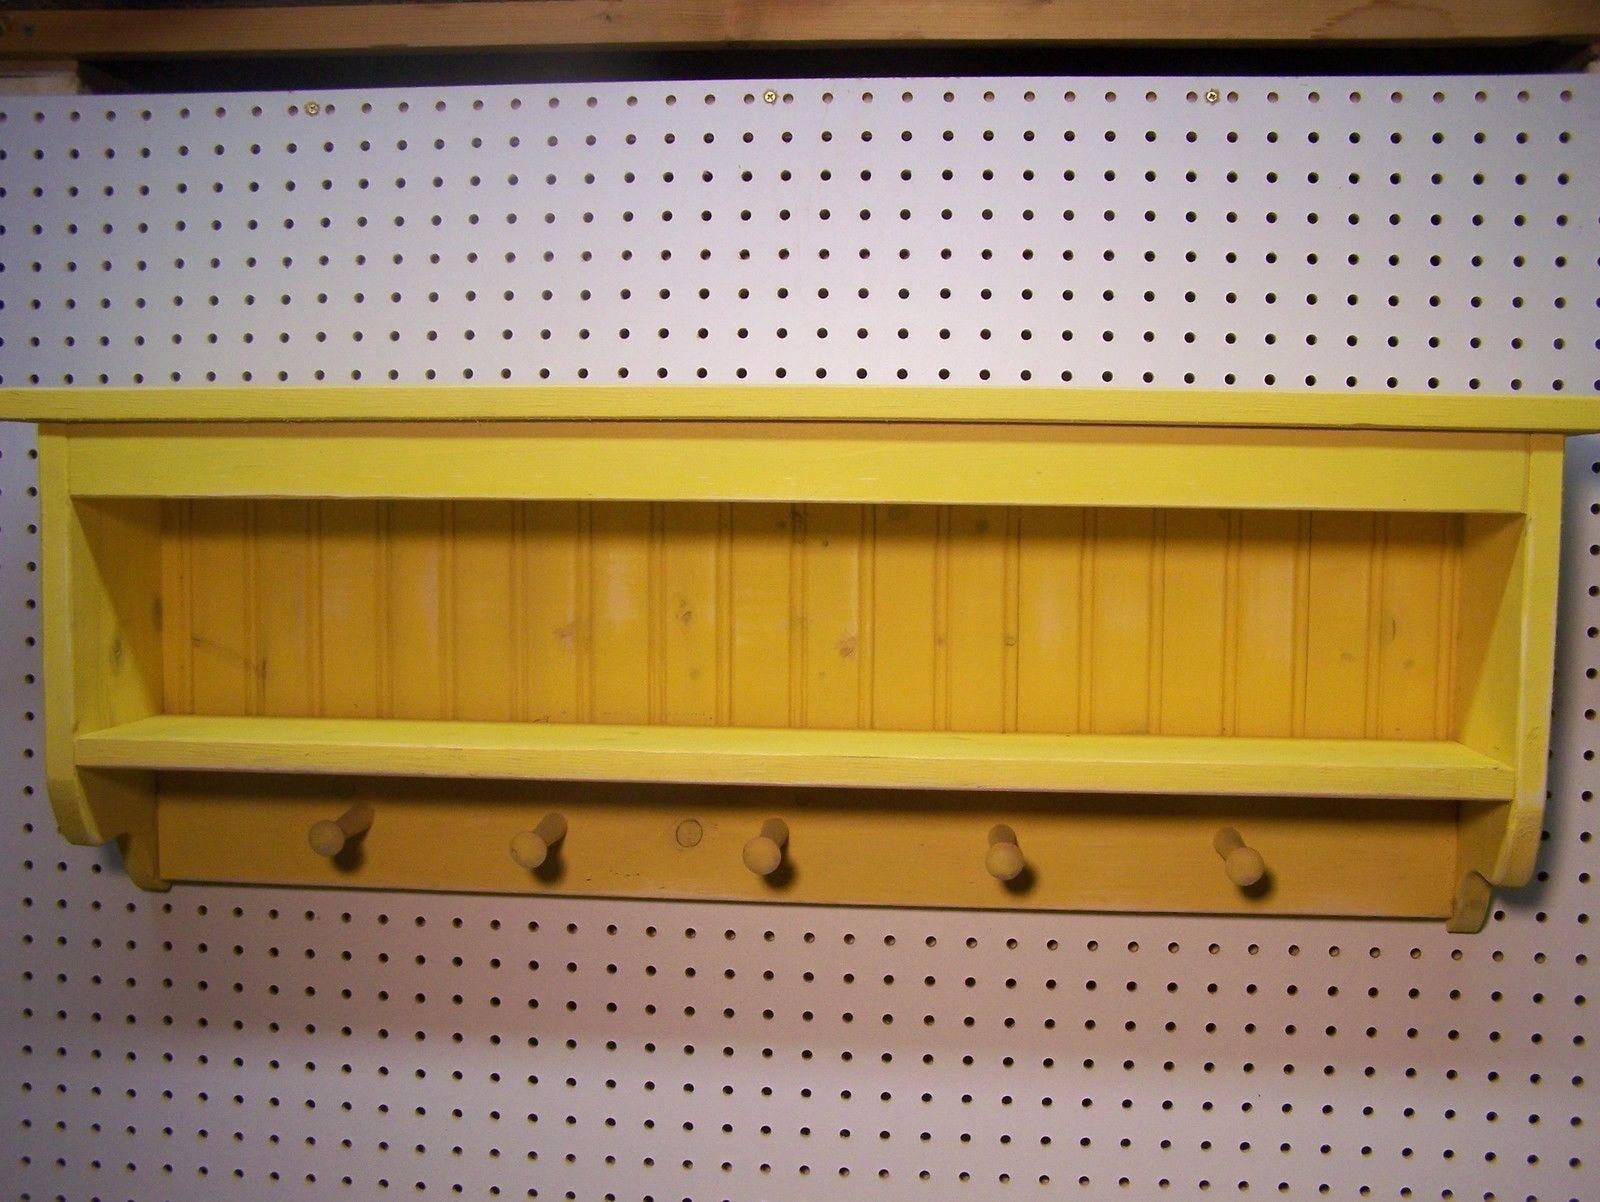 Handmade Primitive Wood Wall Shelf - Shadow Box - Plate Groove ...